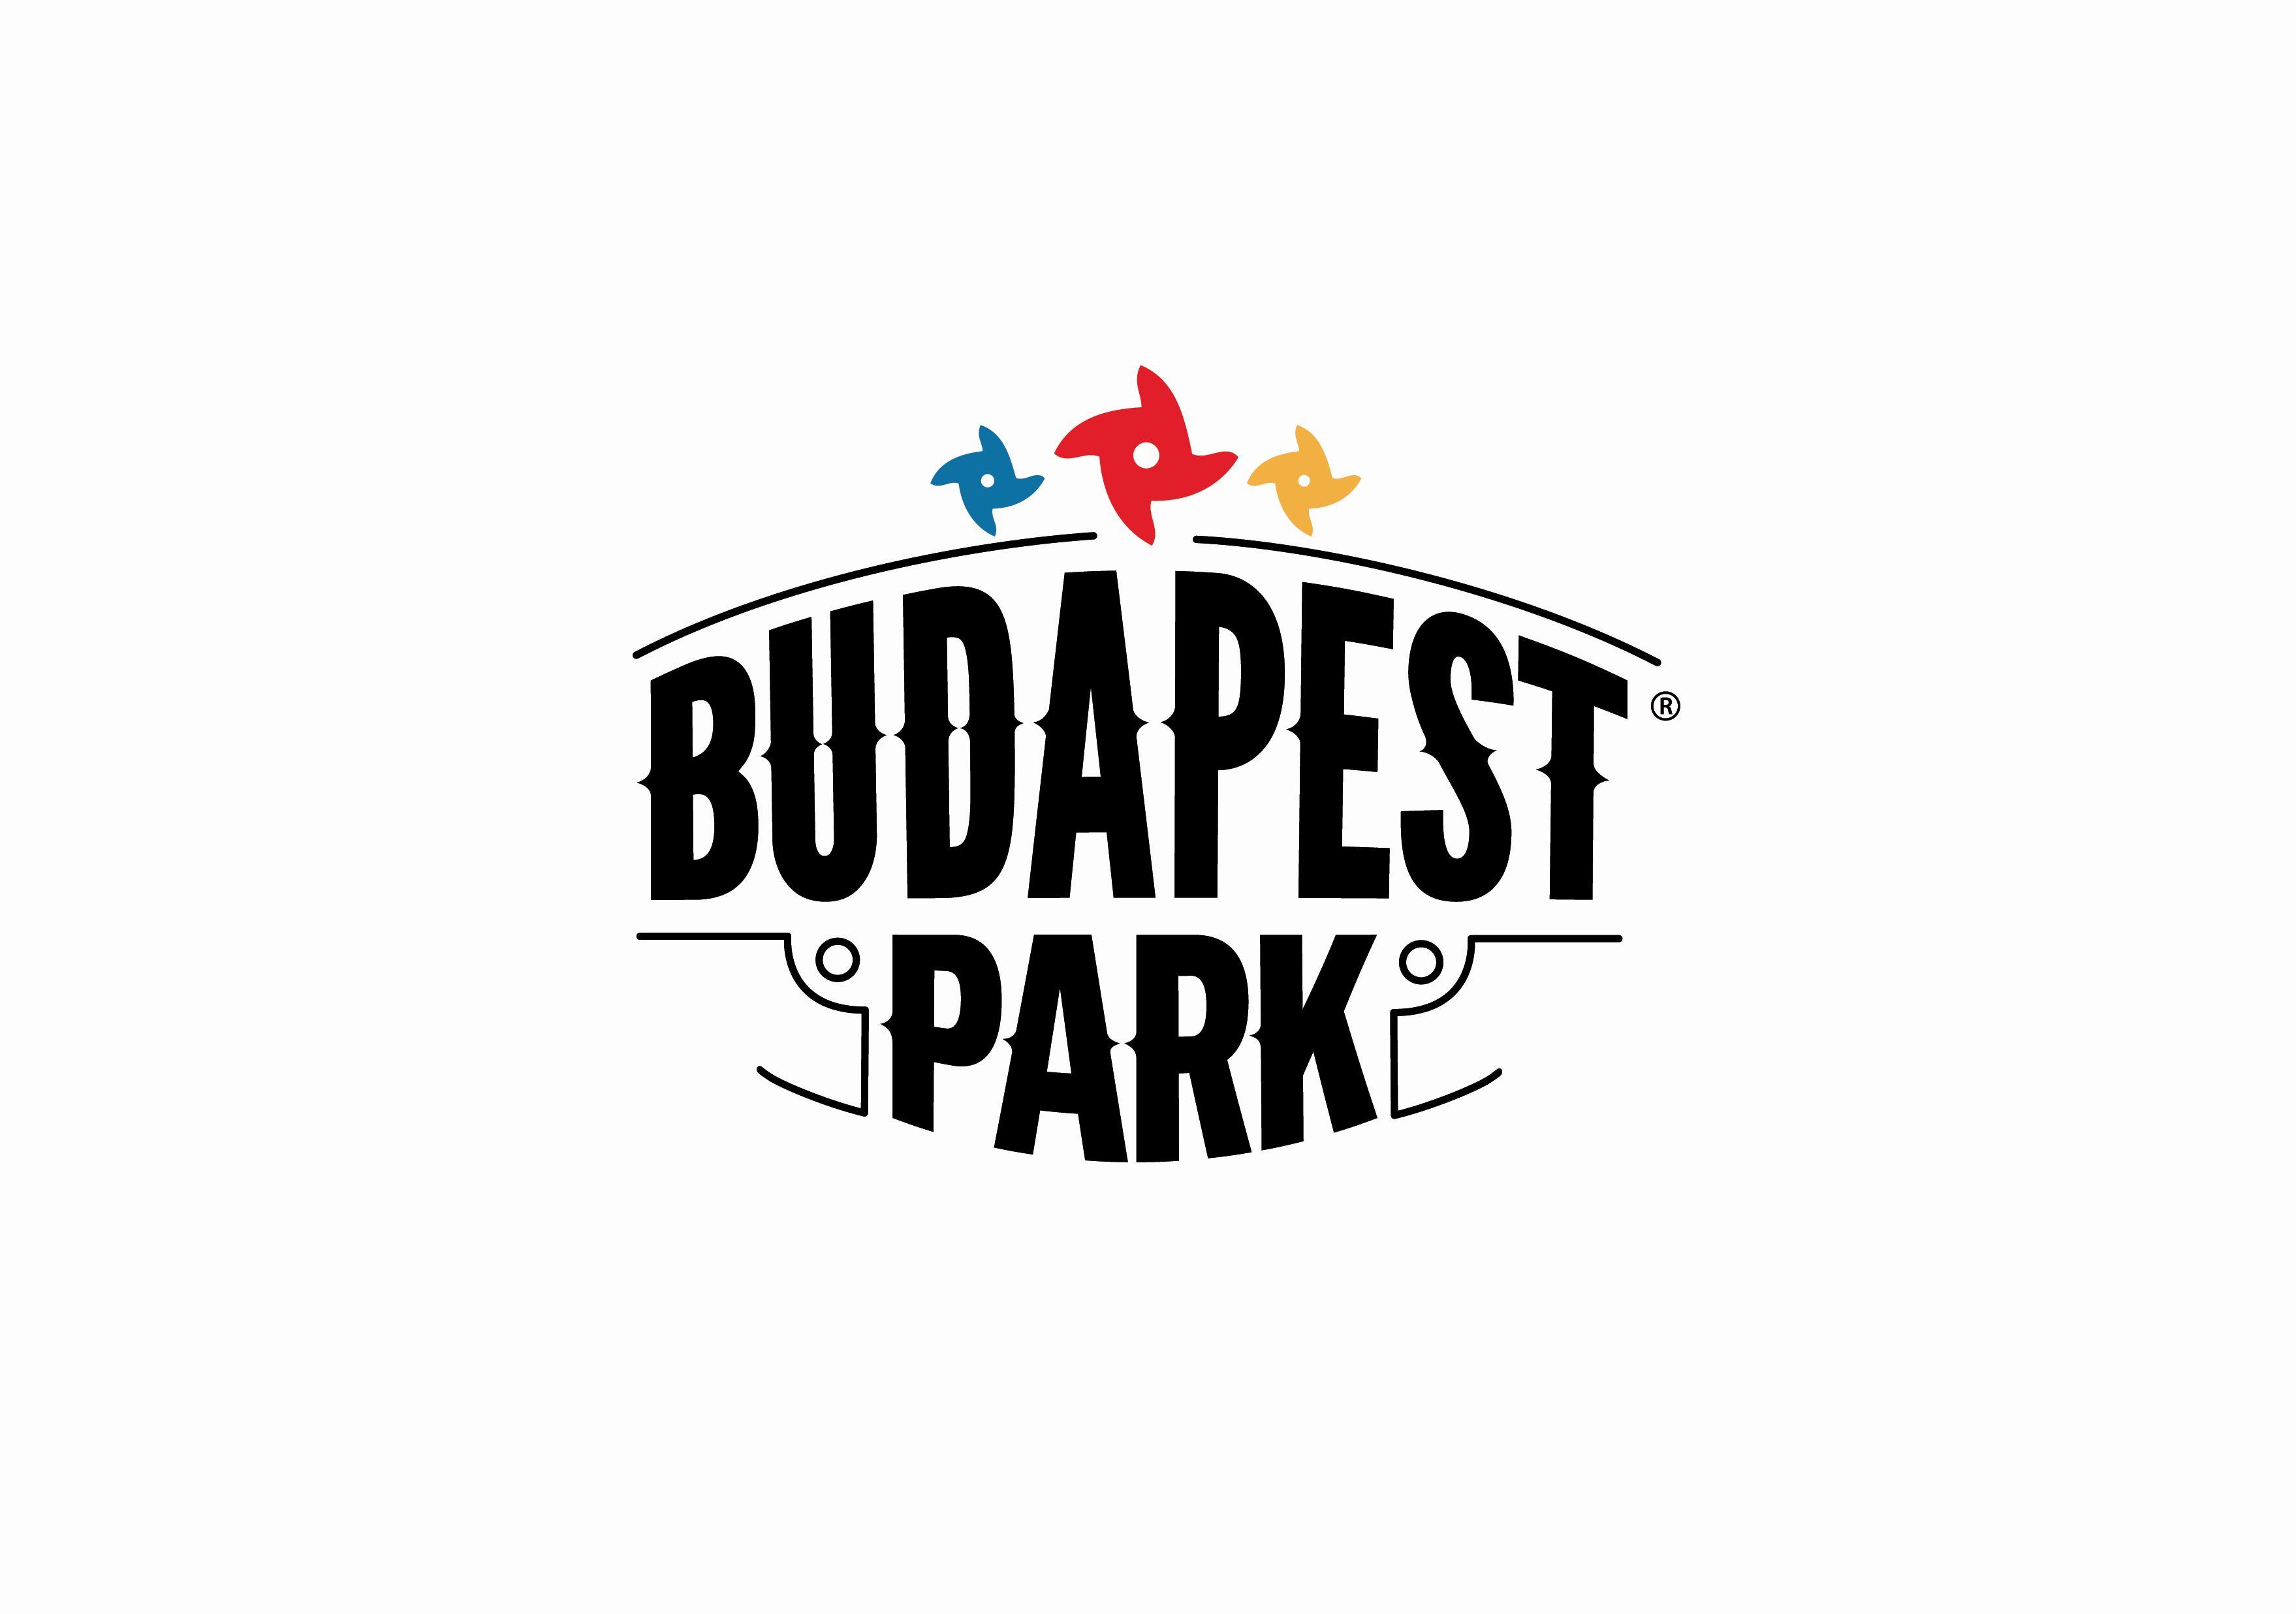 budapest_park_logo.jpg